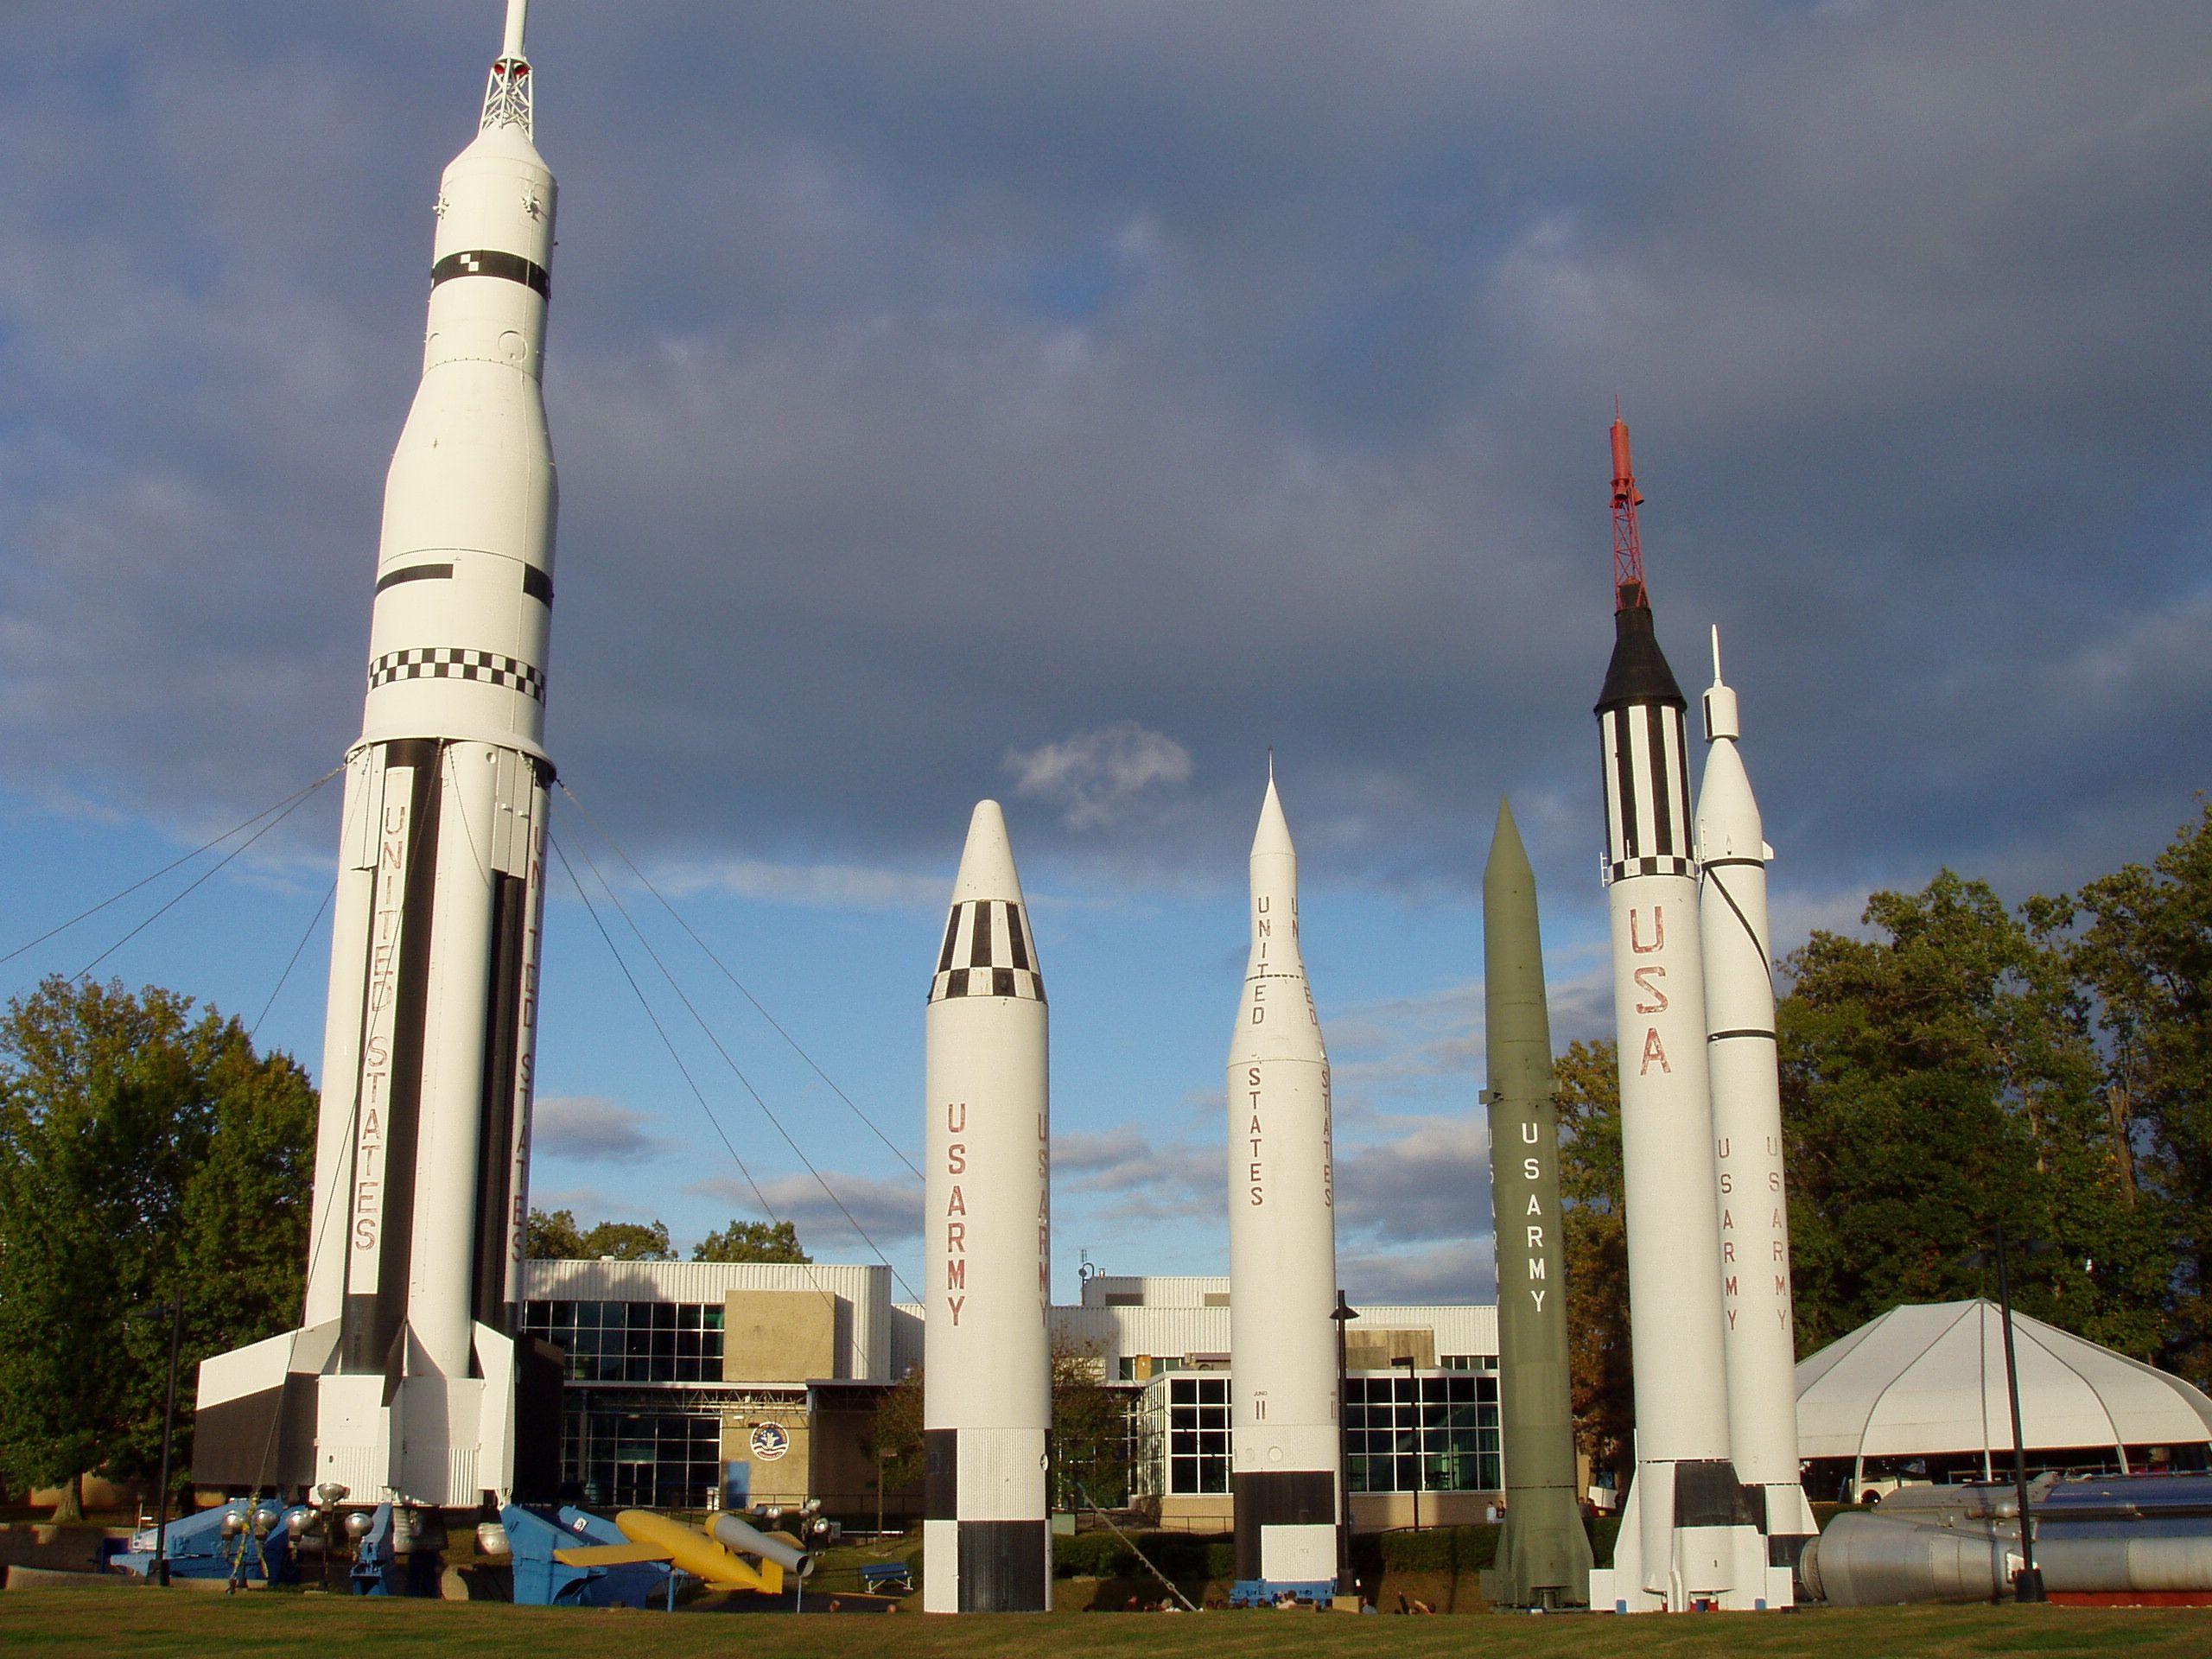 alabama nasa space ride - photo #23